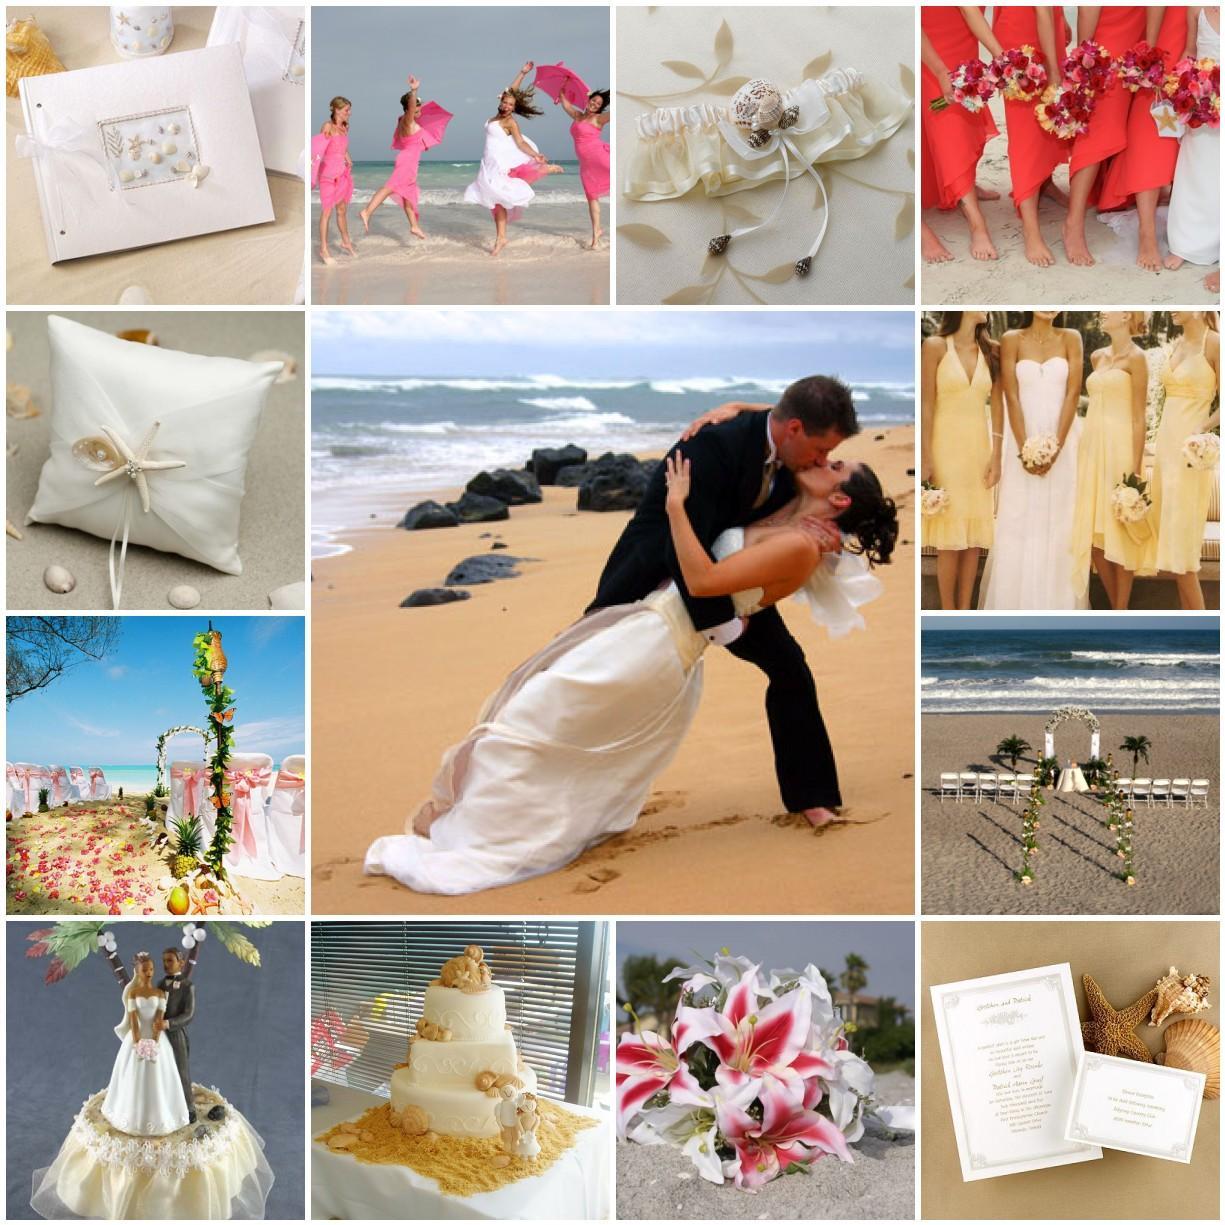 Wedding on the beach - Obrázok č. 70